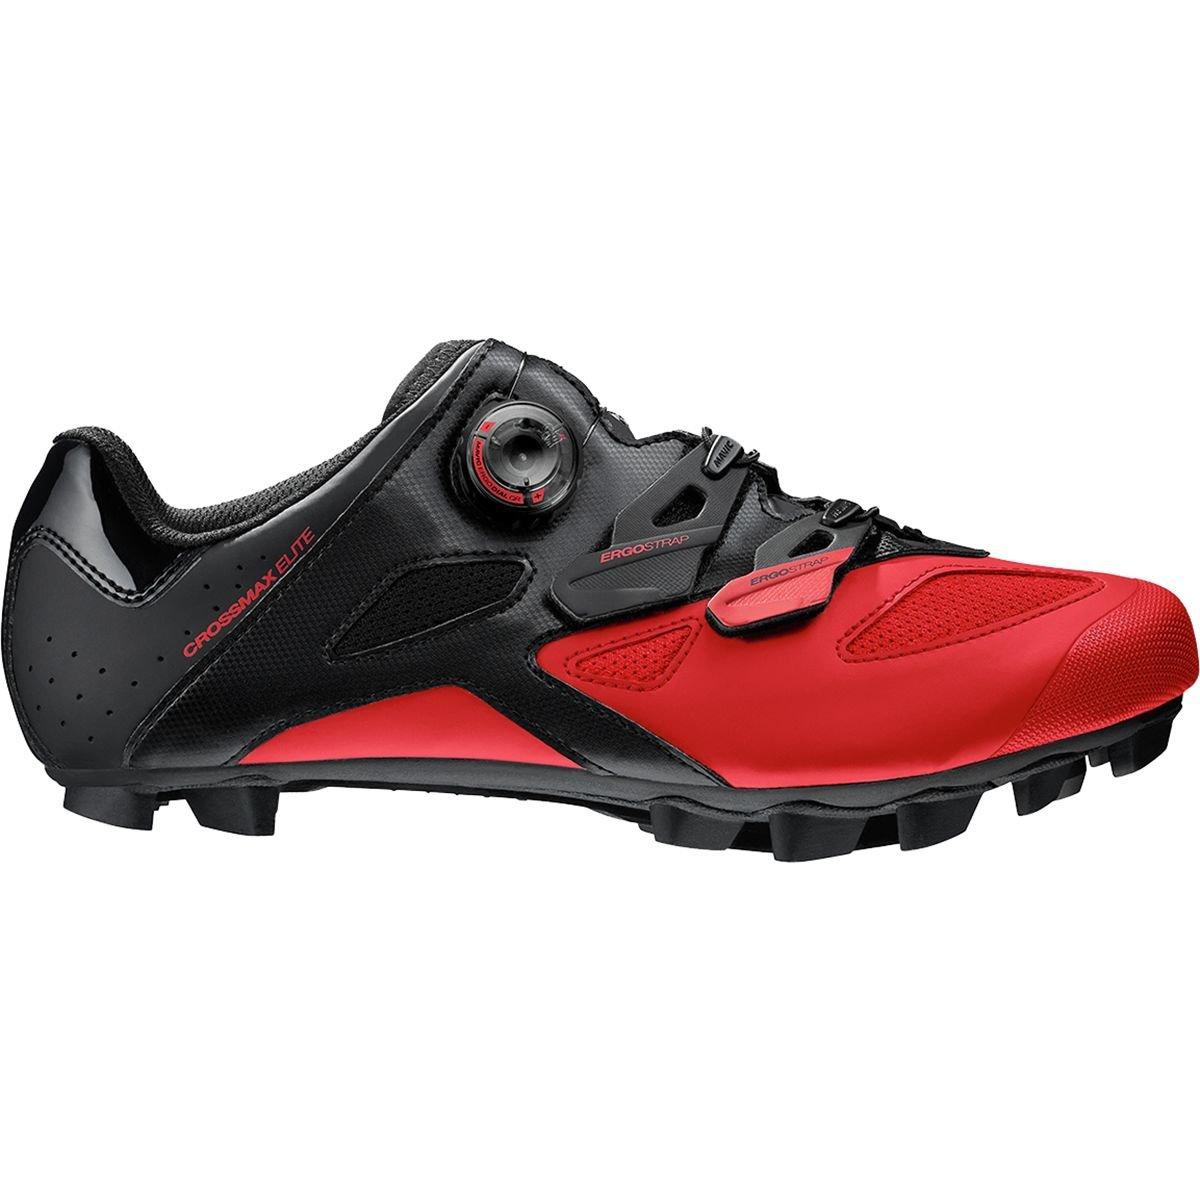 [Mavic] Crossmax Elite マウンテンバイクシューズ メンズ B01LWZ30WM 10.5 M US|Black/Fiery Red Black/Fiery Red 10.5 M US